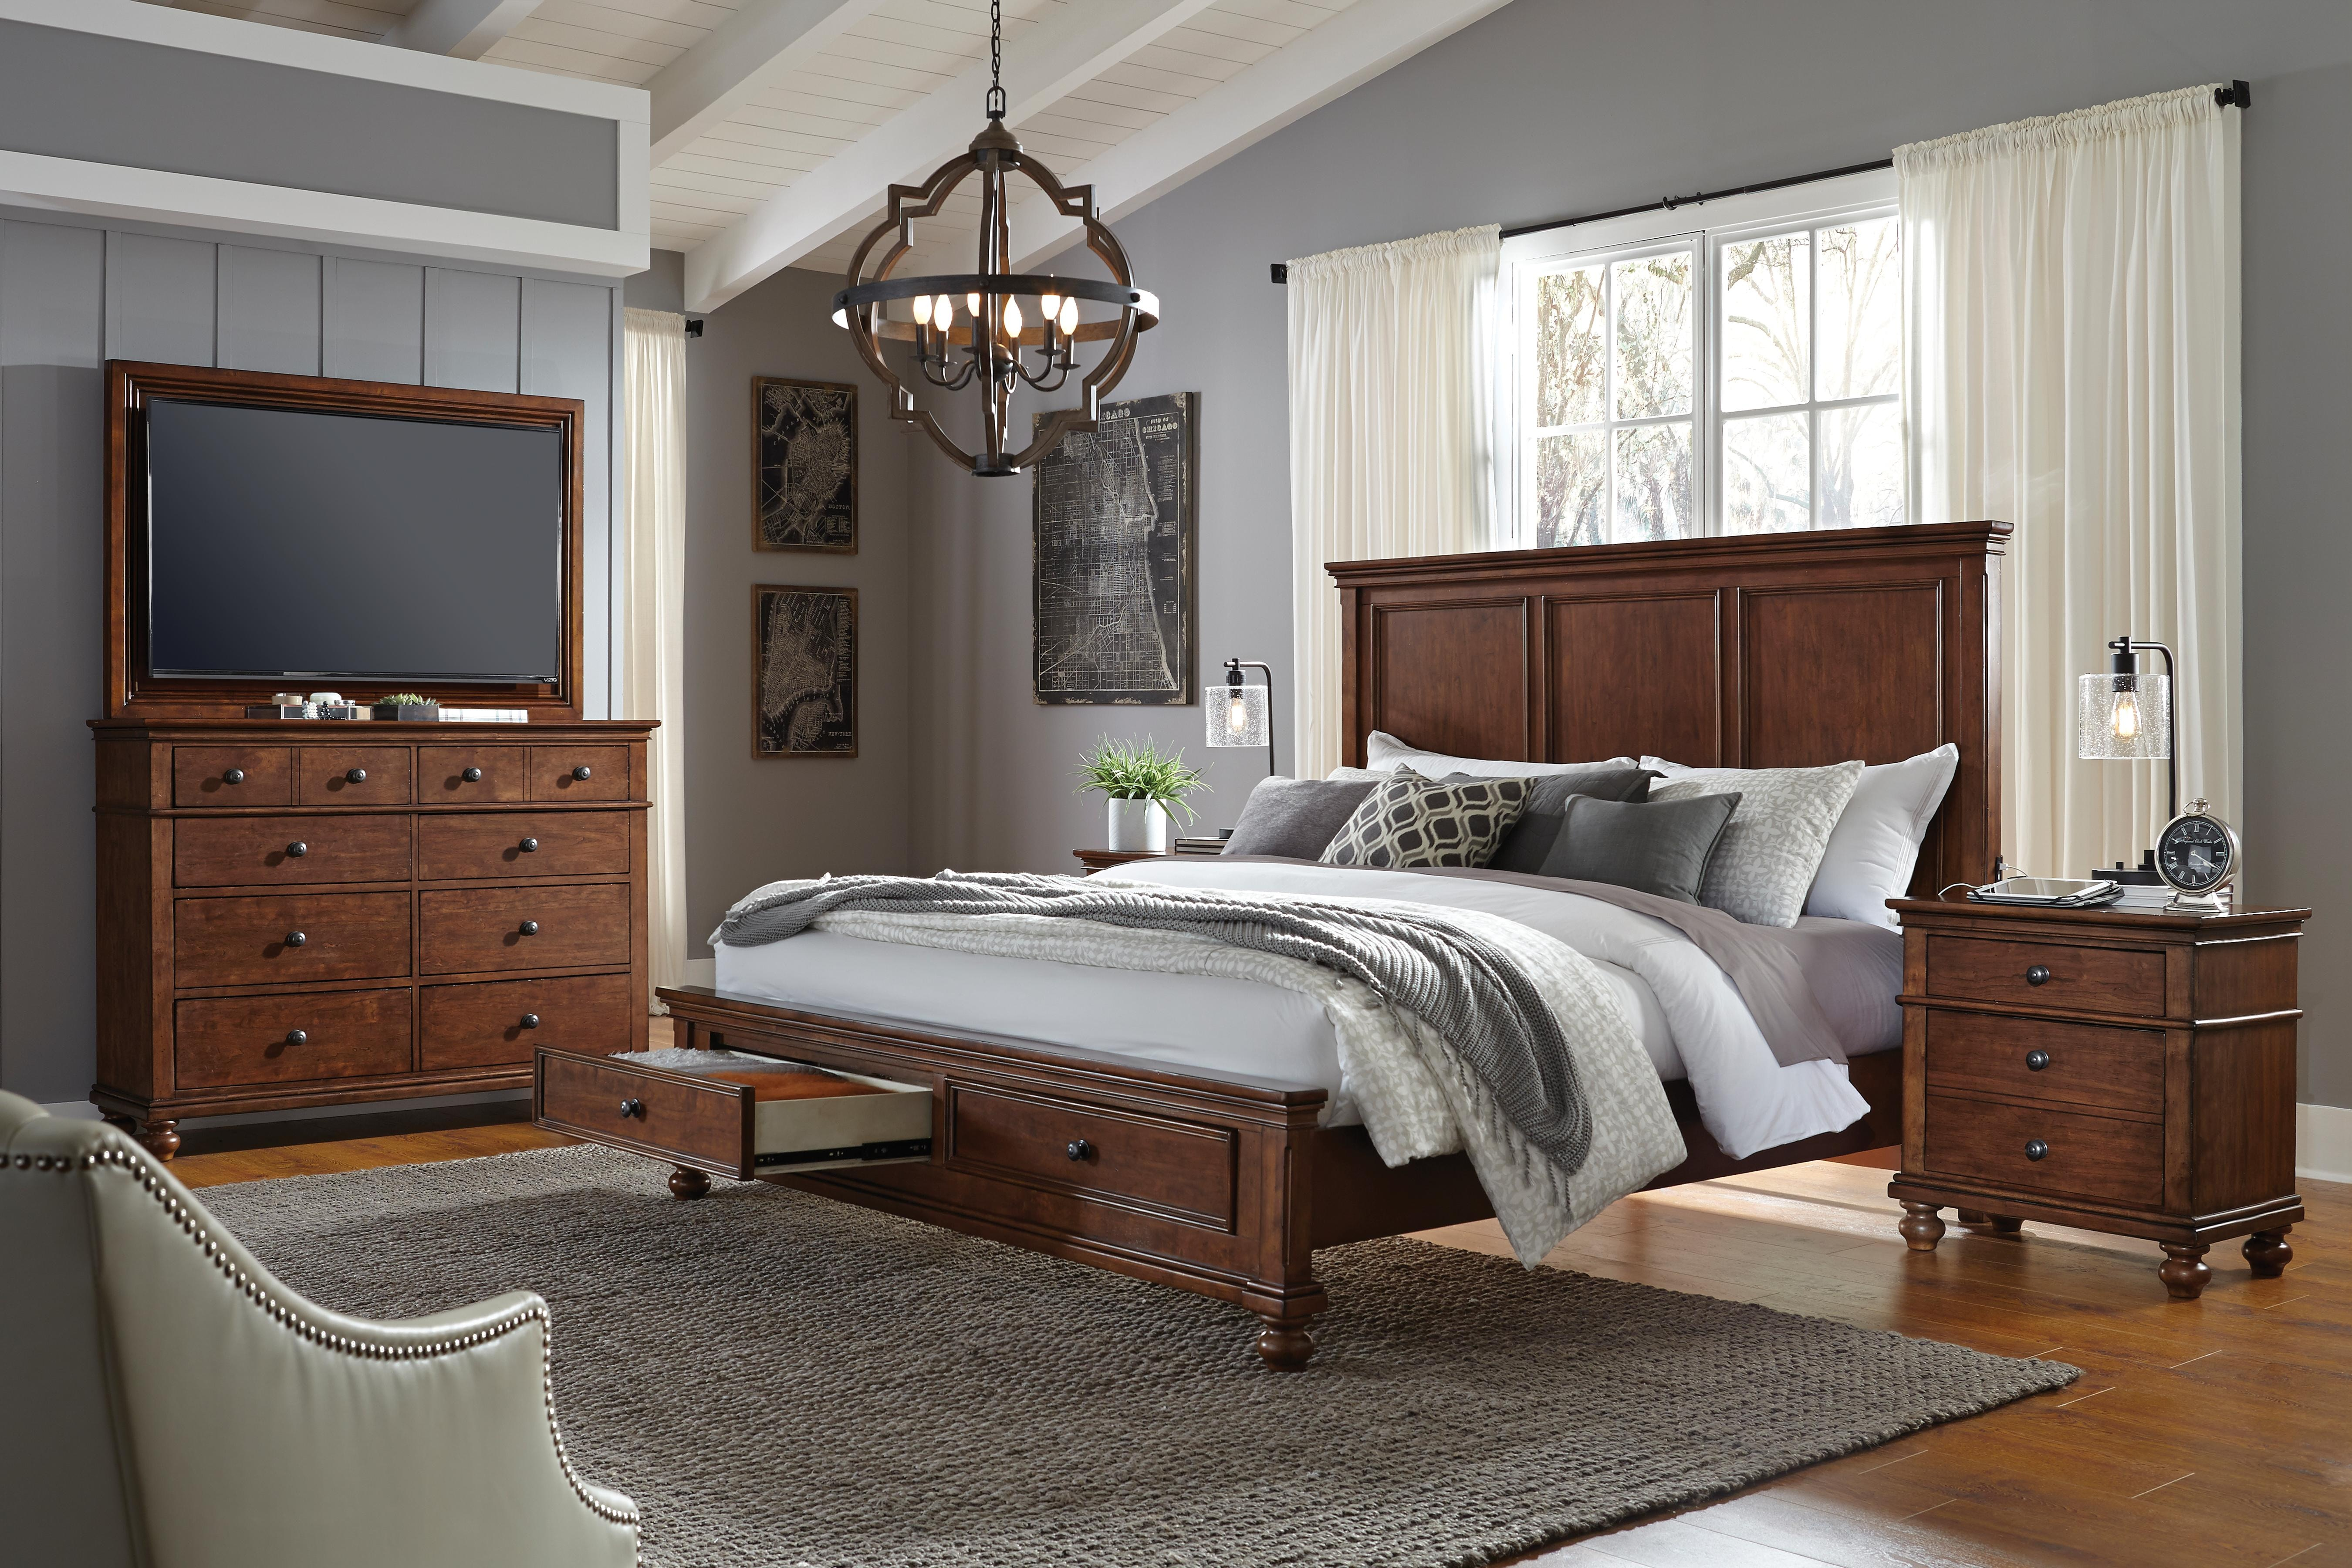 aspenhome Furniture Oxford 2 Drawer Nightstand I07 450 WBR